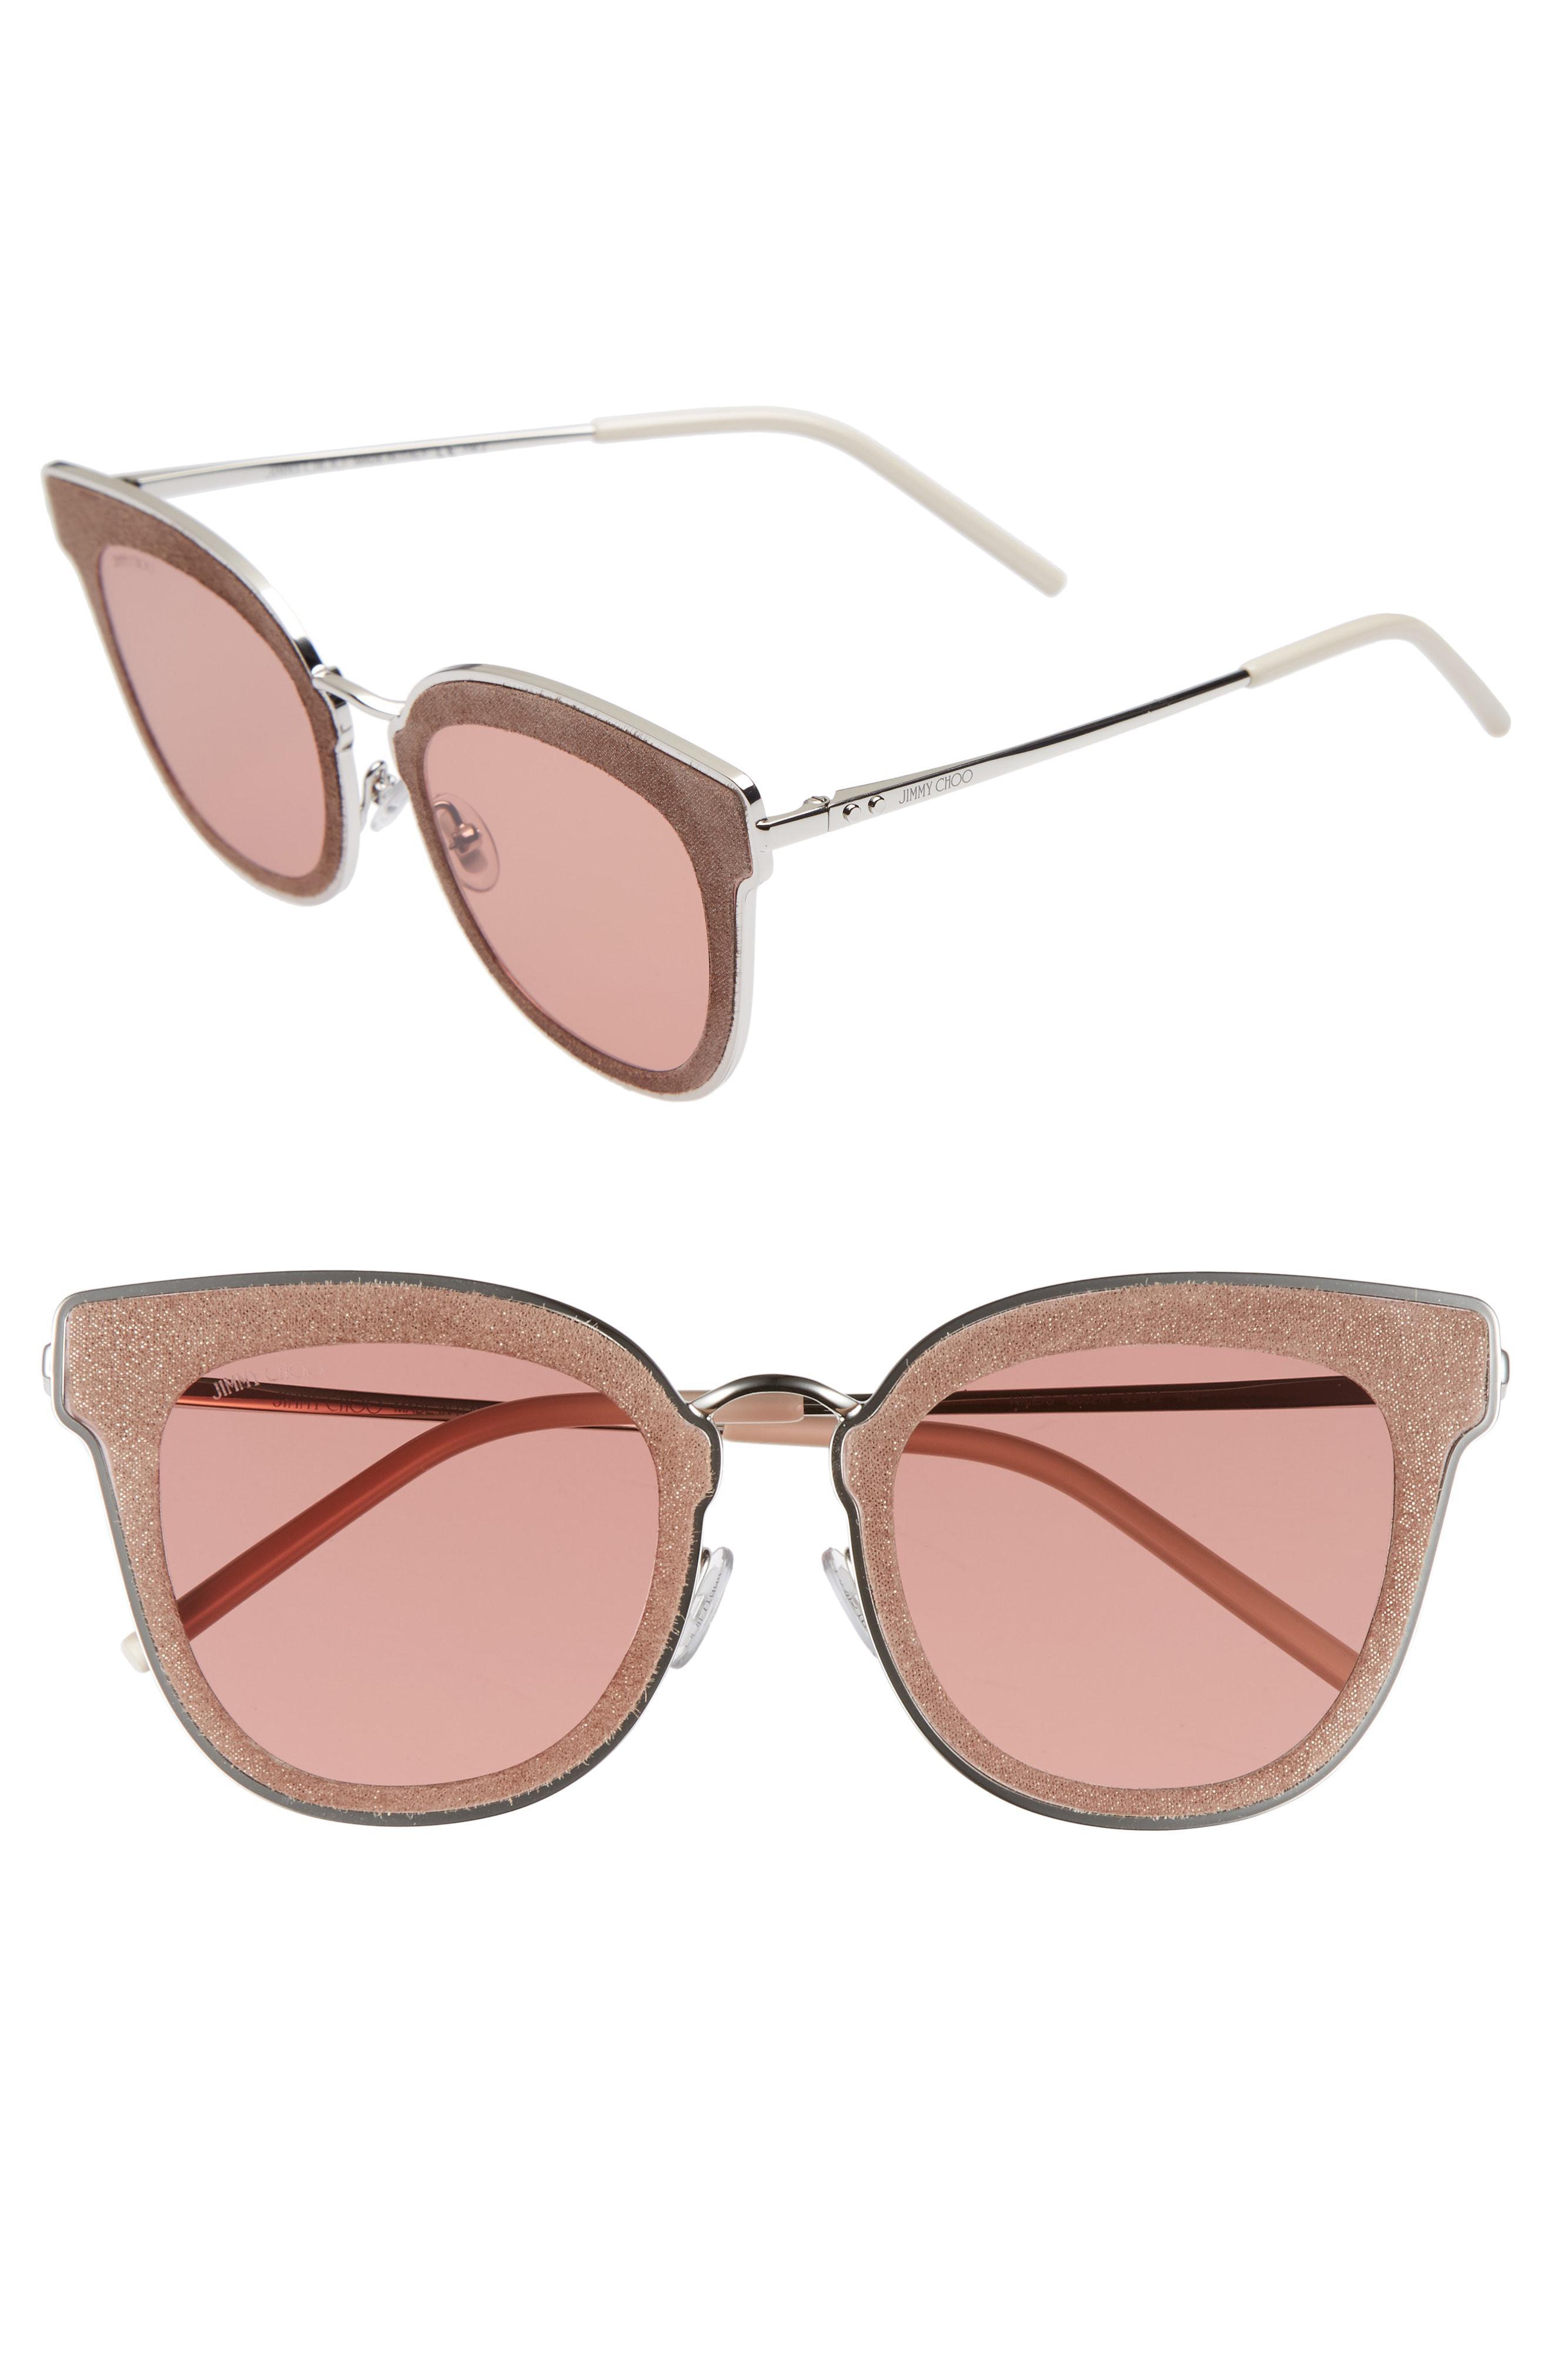 337f125c113 Lyst - Jimmy Choo Niles 63mm Oversize Cat Eye Sunglasses -